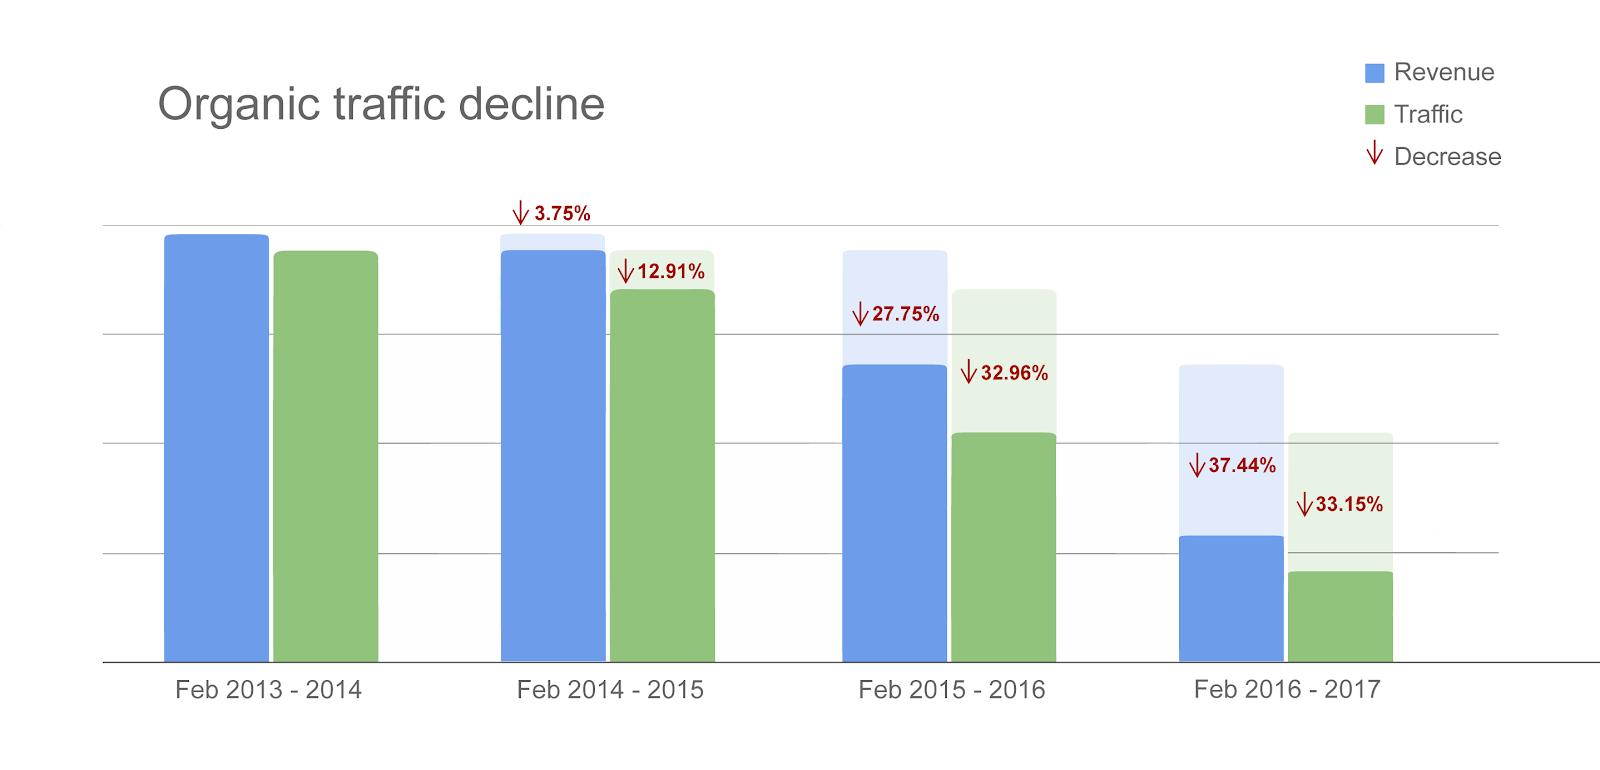 Organic traffic decline